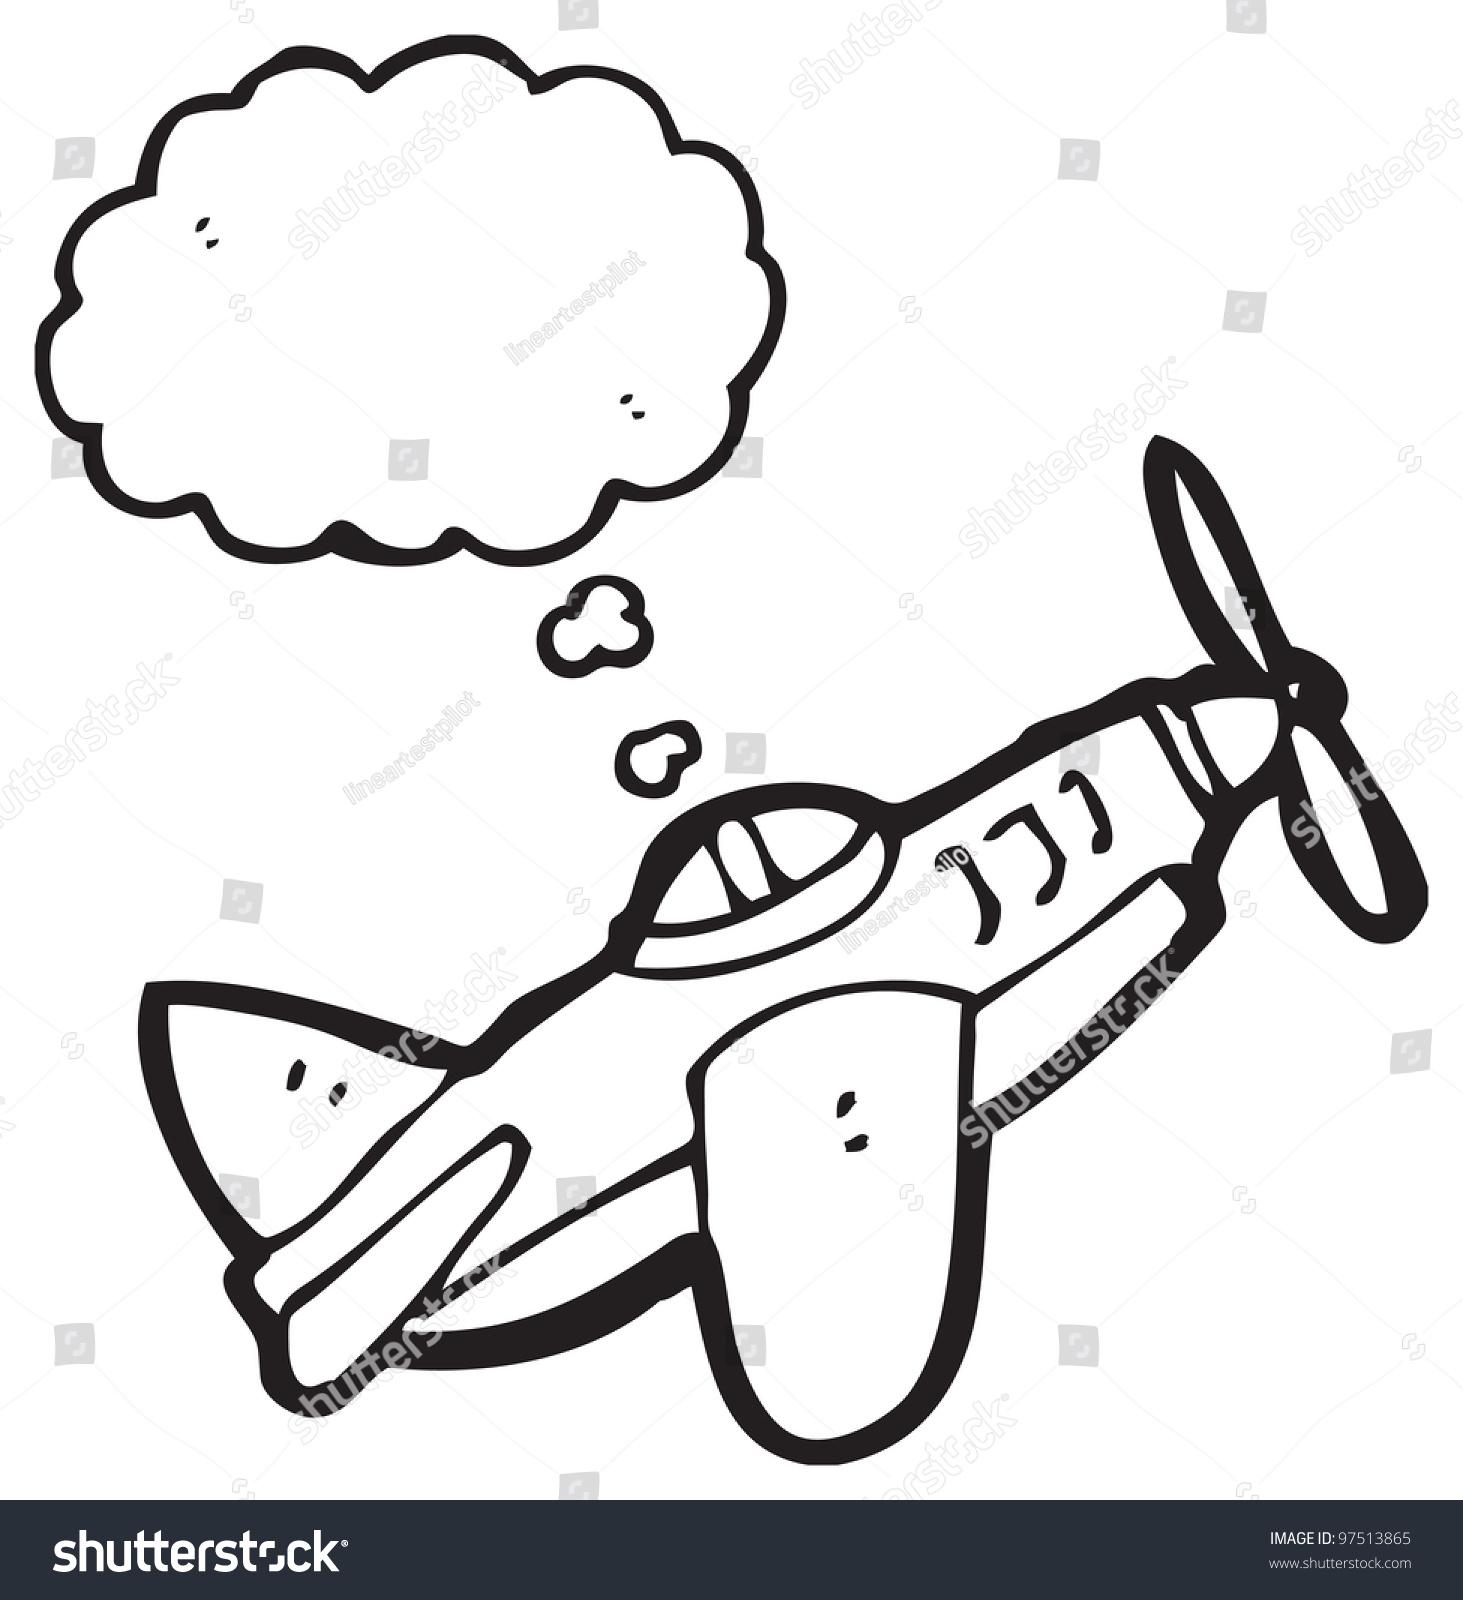 1463x1600 Cartoon Airplane Drawing Cartoon Airplane Stock Illustration